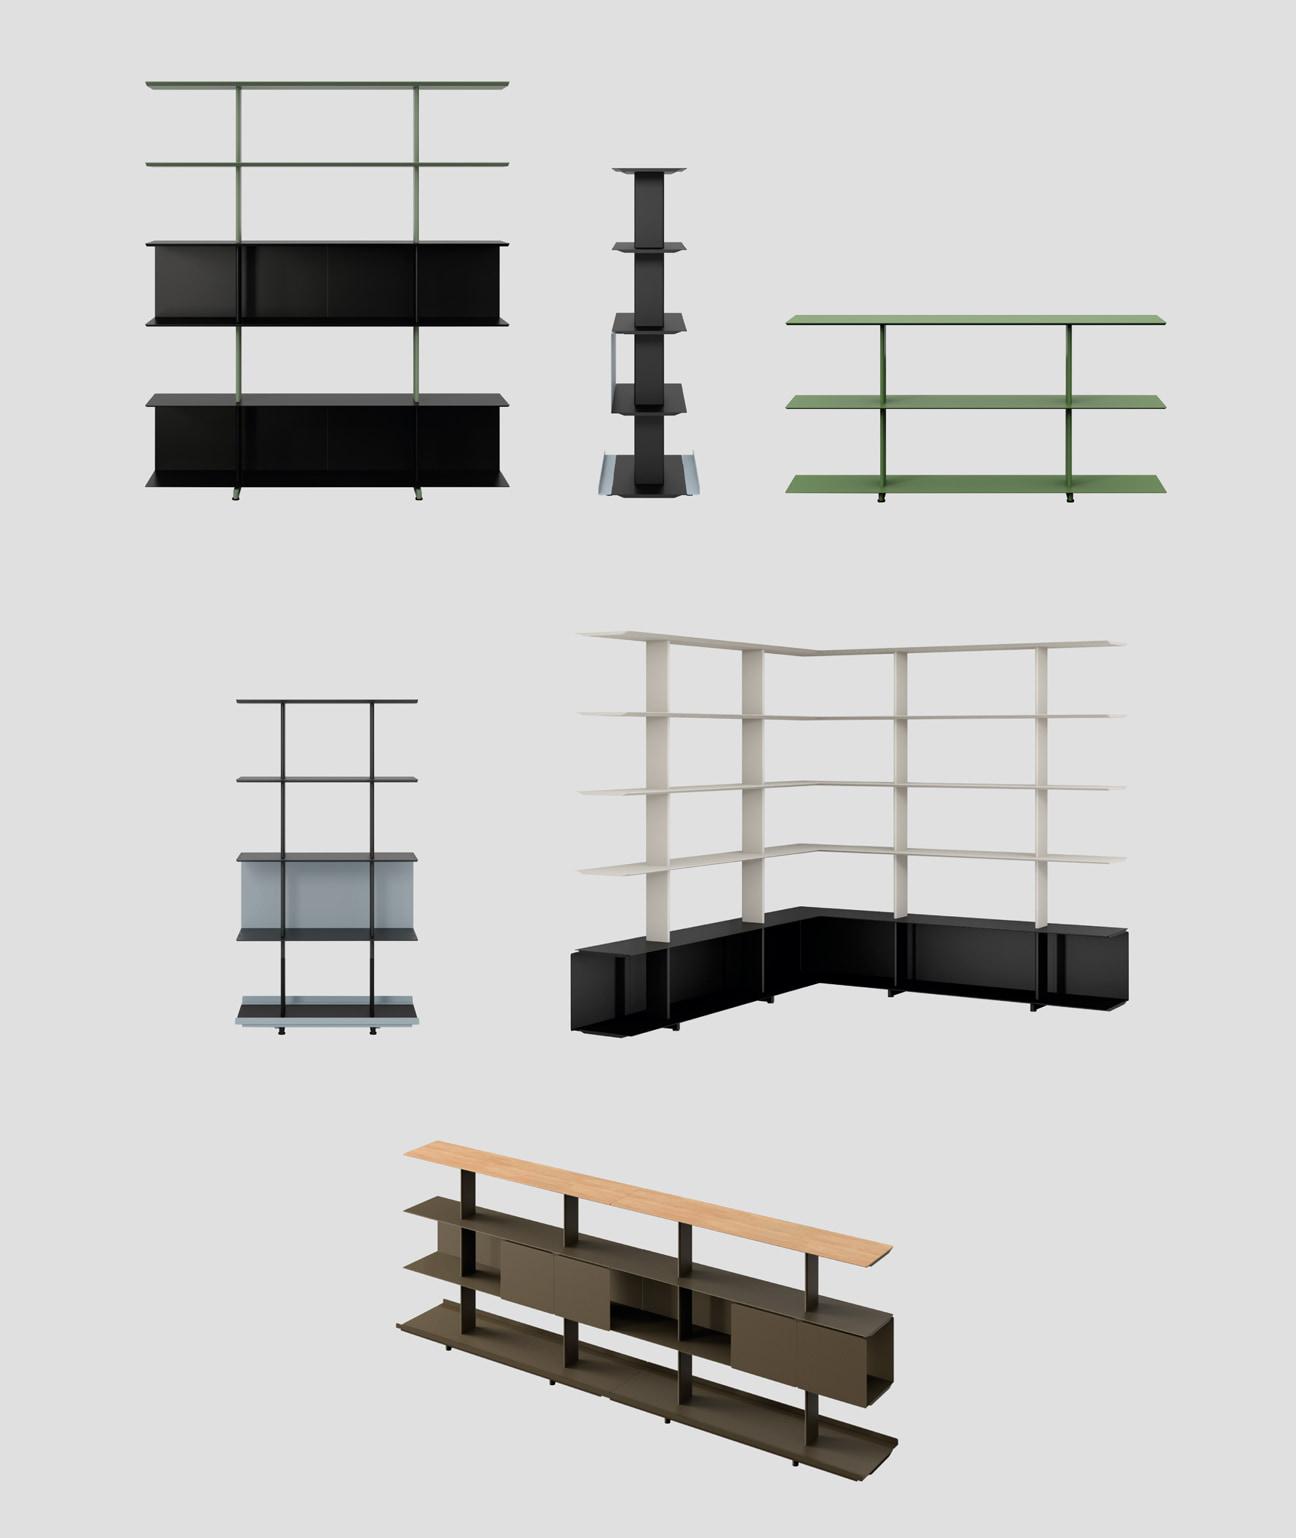 plano muebles de biblioteca